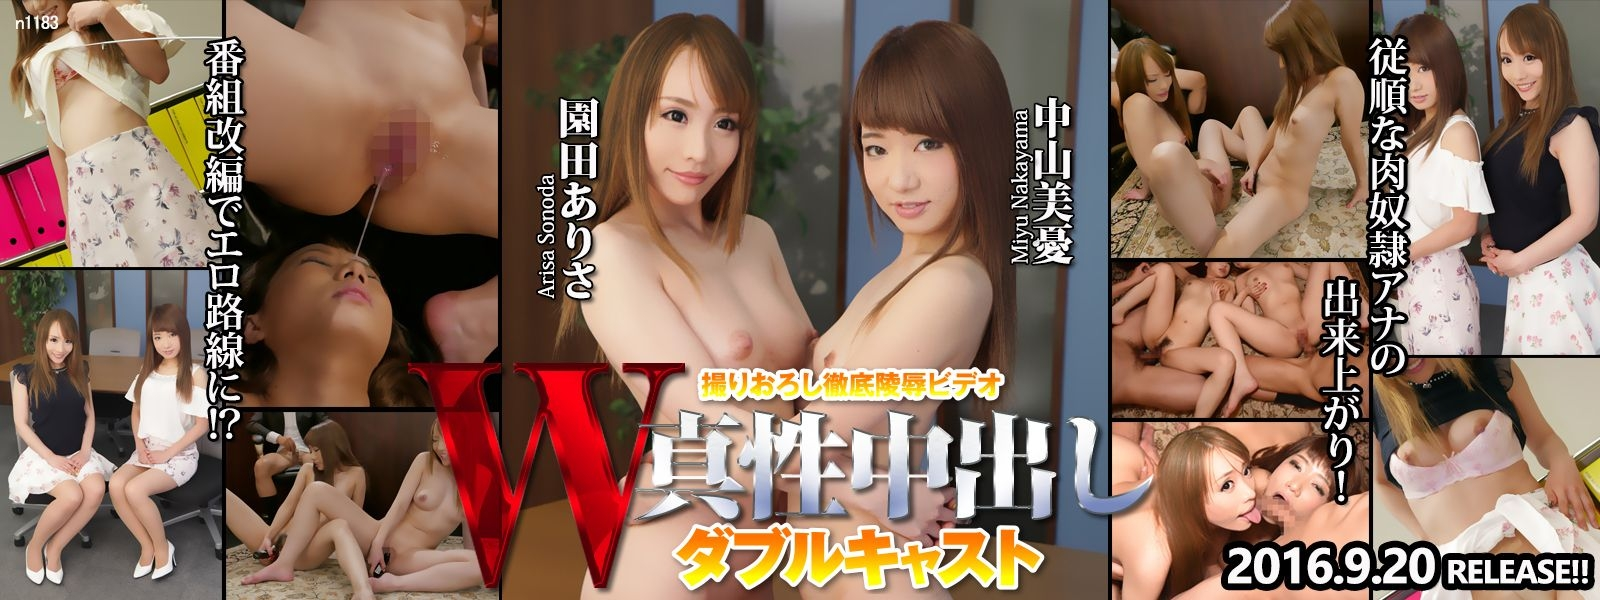 JAV Free HD online Tokyo Hot n1183 Miyu Nakayama, Arisa Sonoda